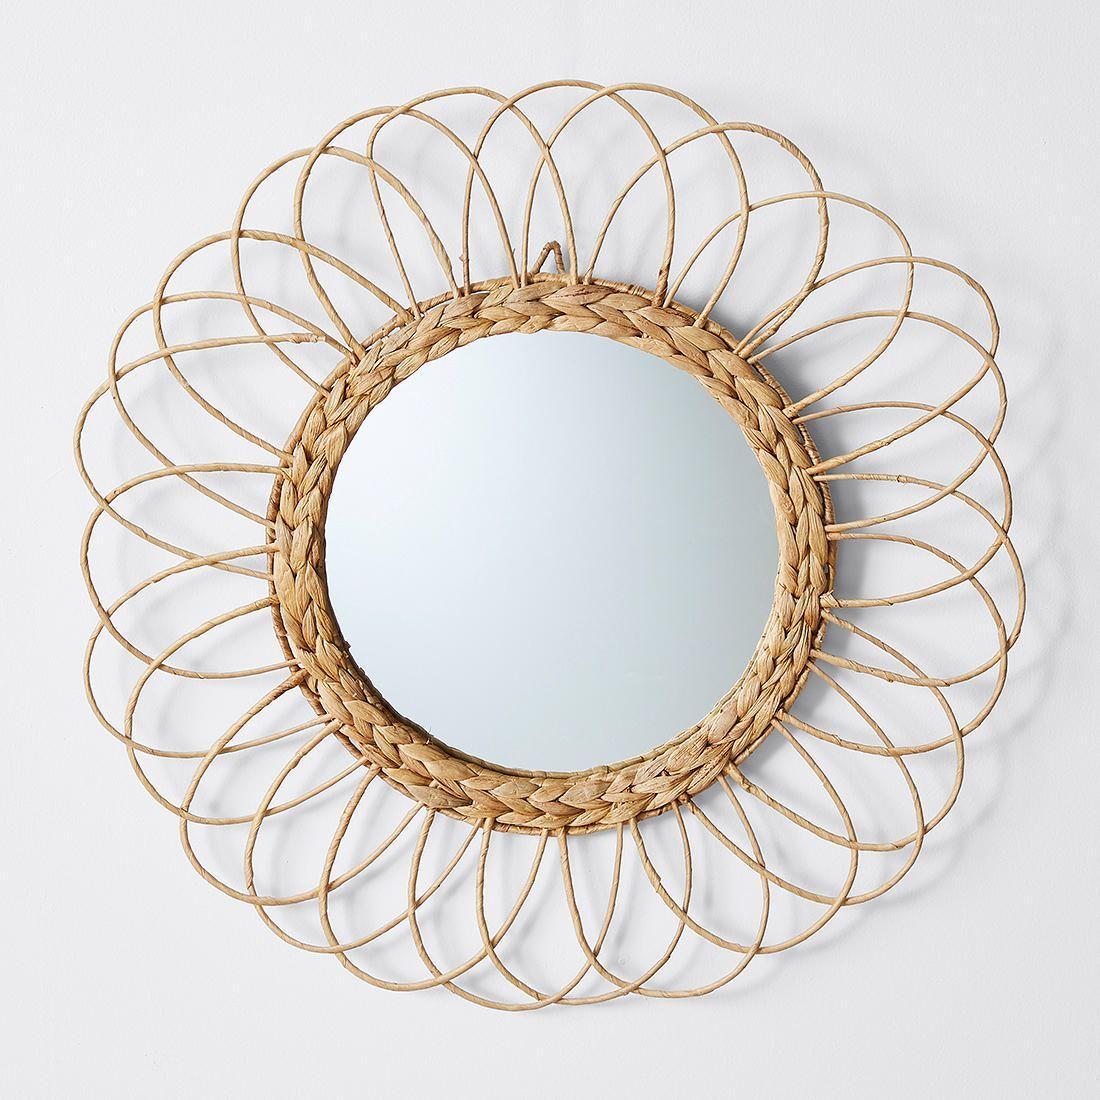 Sunflower Decorative Mirror | Dream home in 2019 | Target